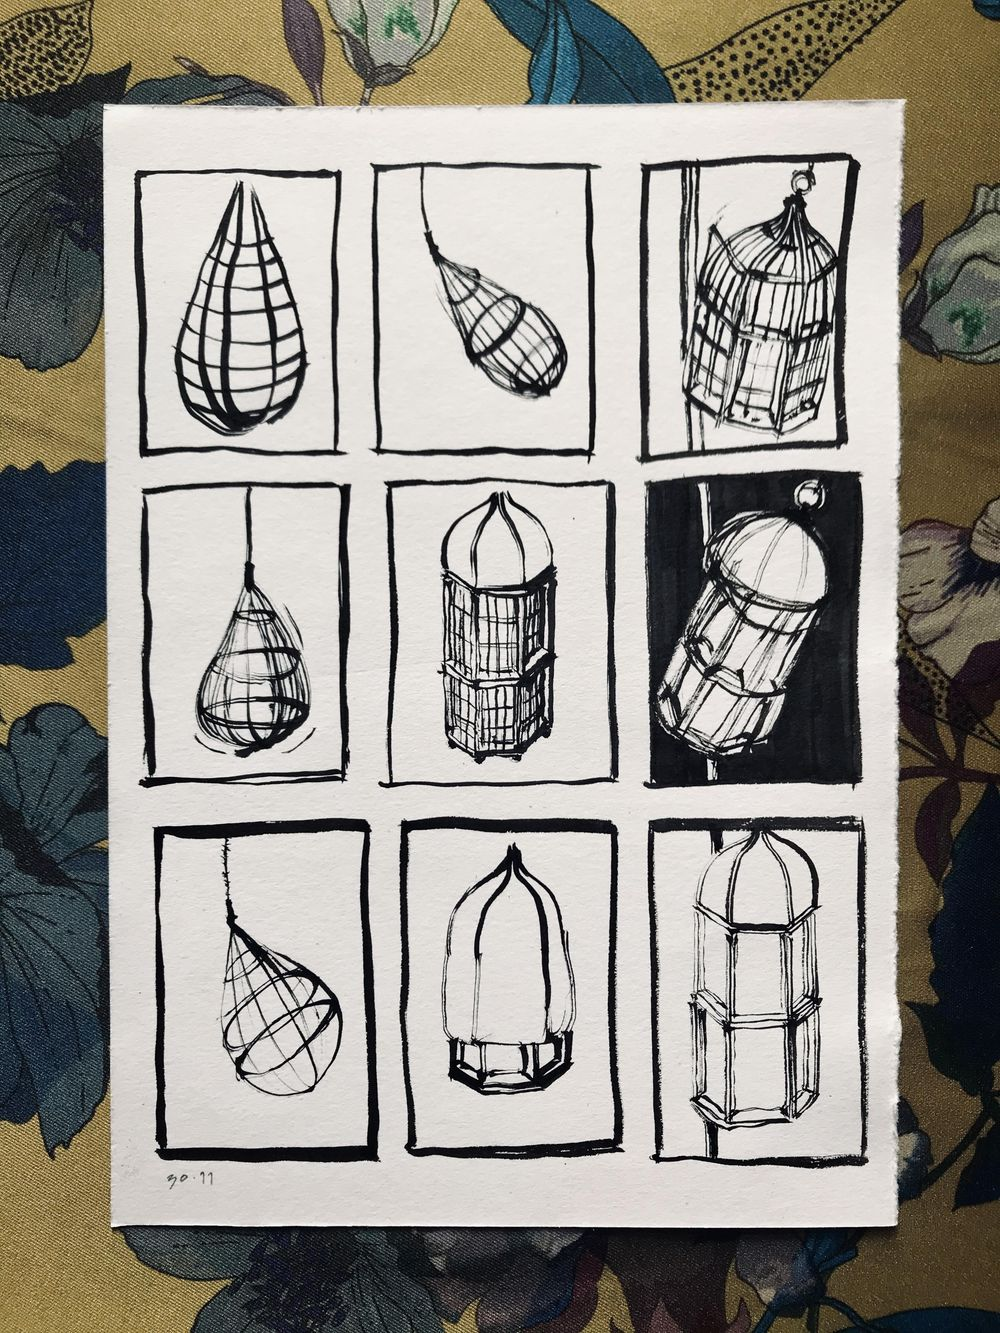 Overcoming artist's block - image 3 - student project